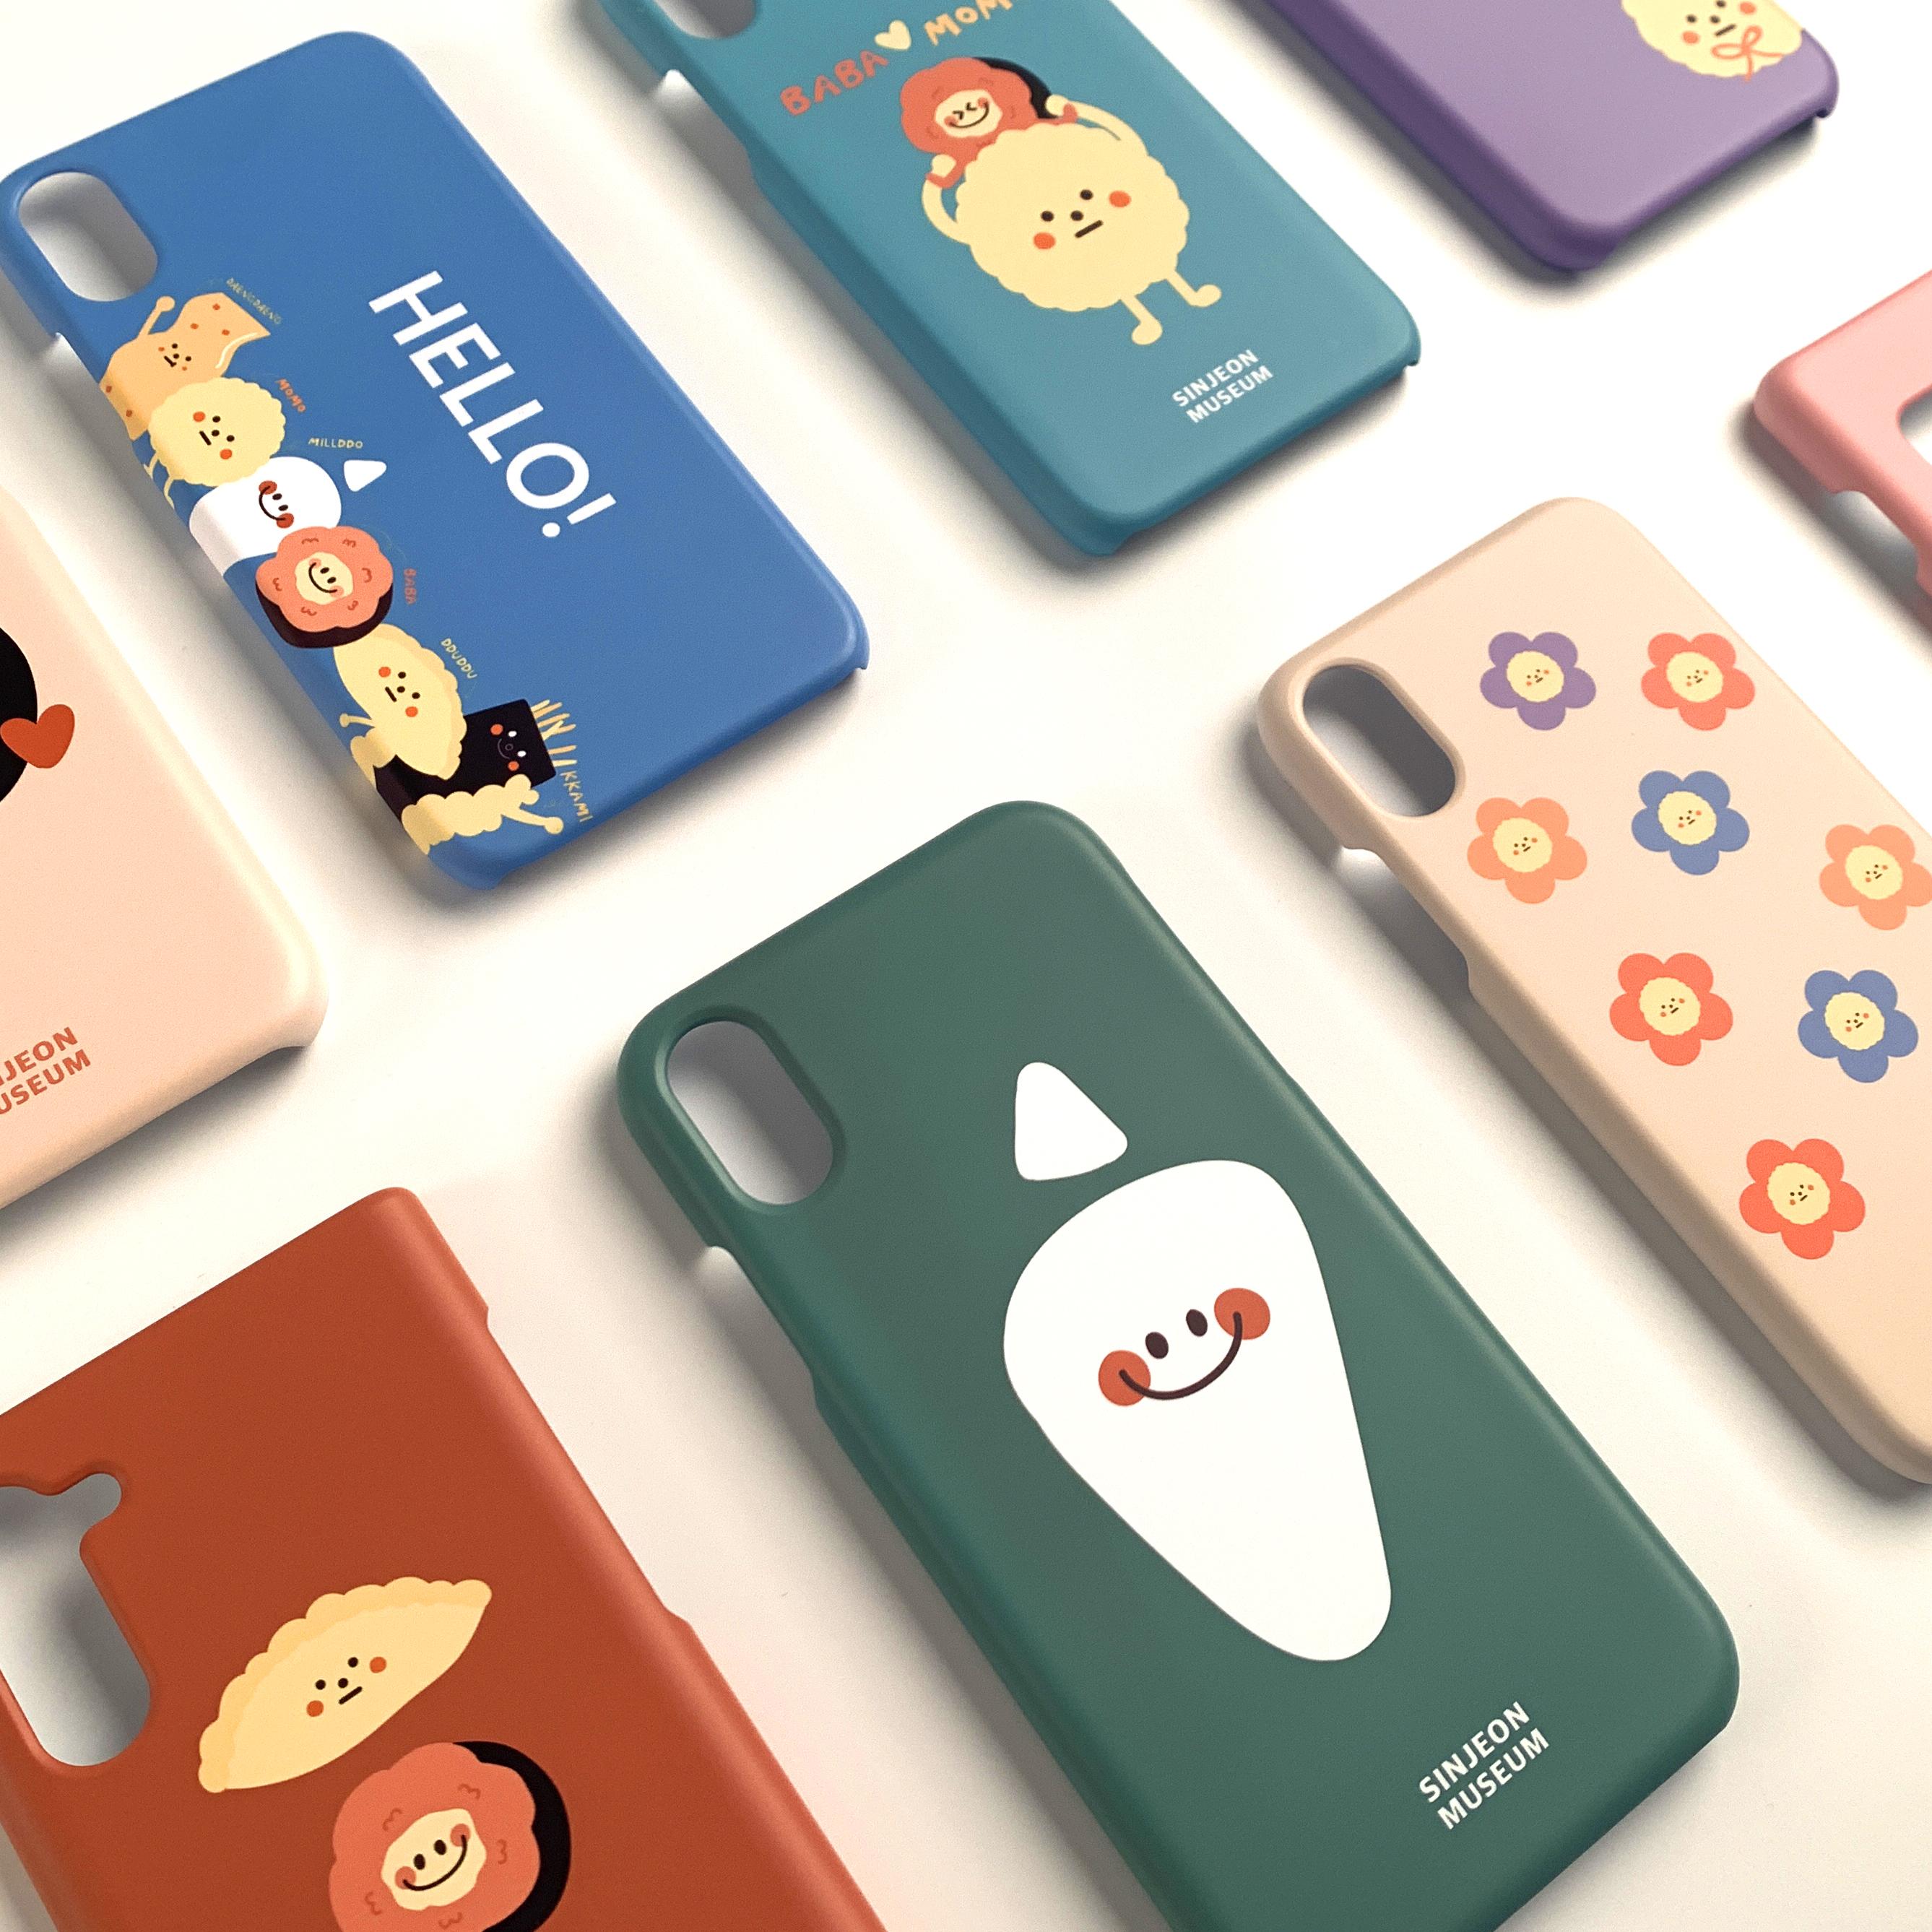 [Phone case] Hard case